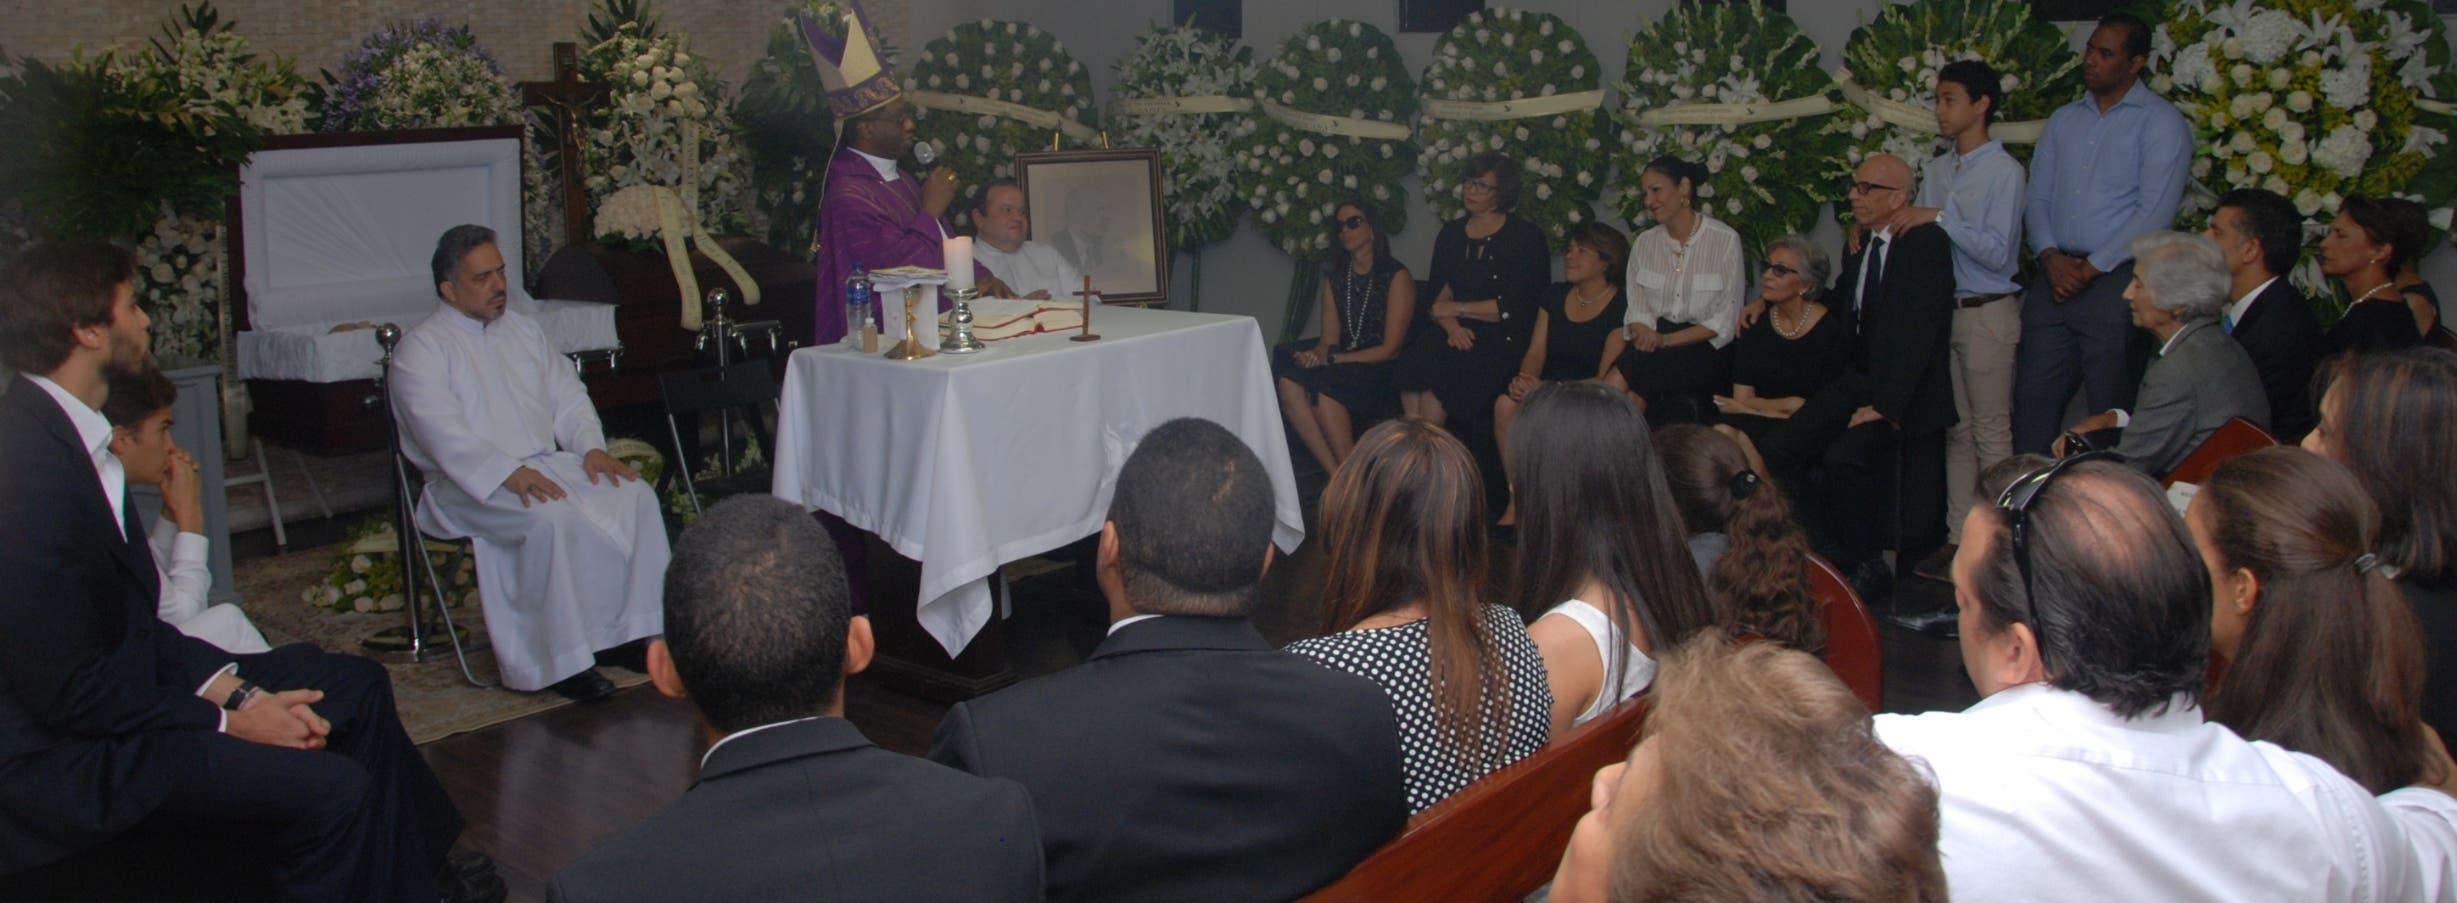 Nuncio Apostólico resalta dotes y fortalezas de Molina Morillo